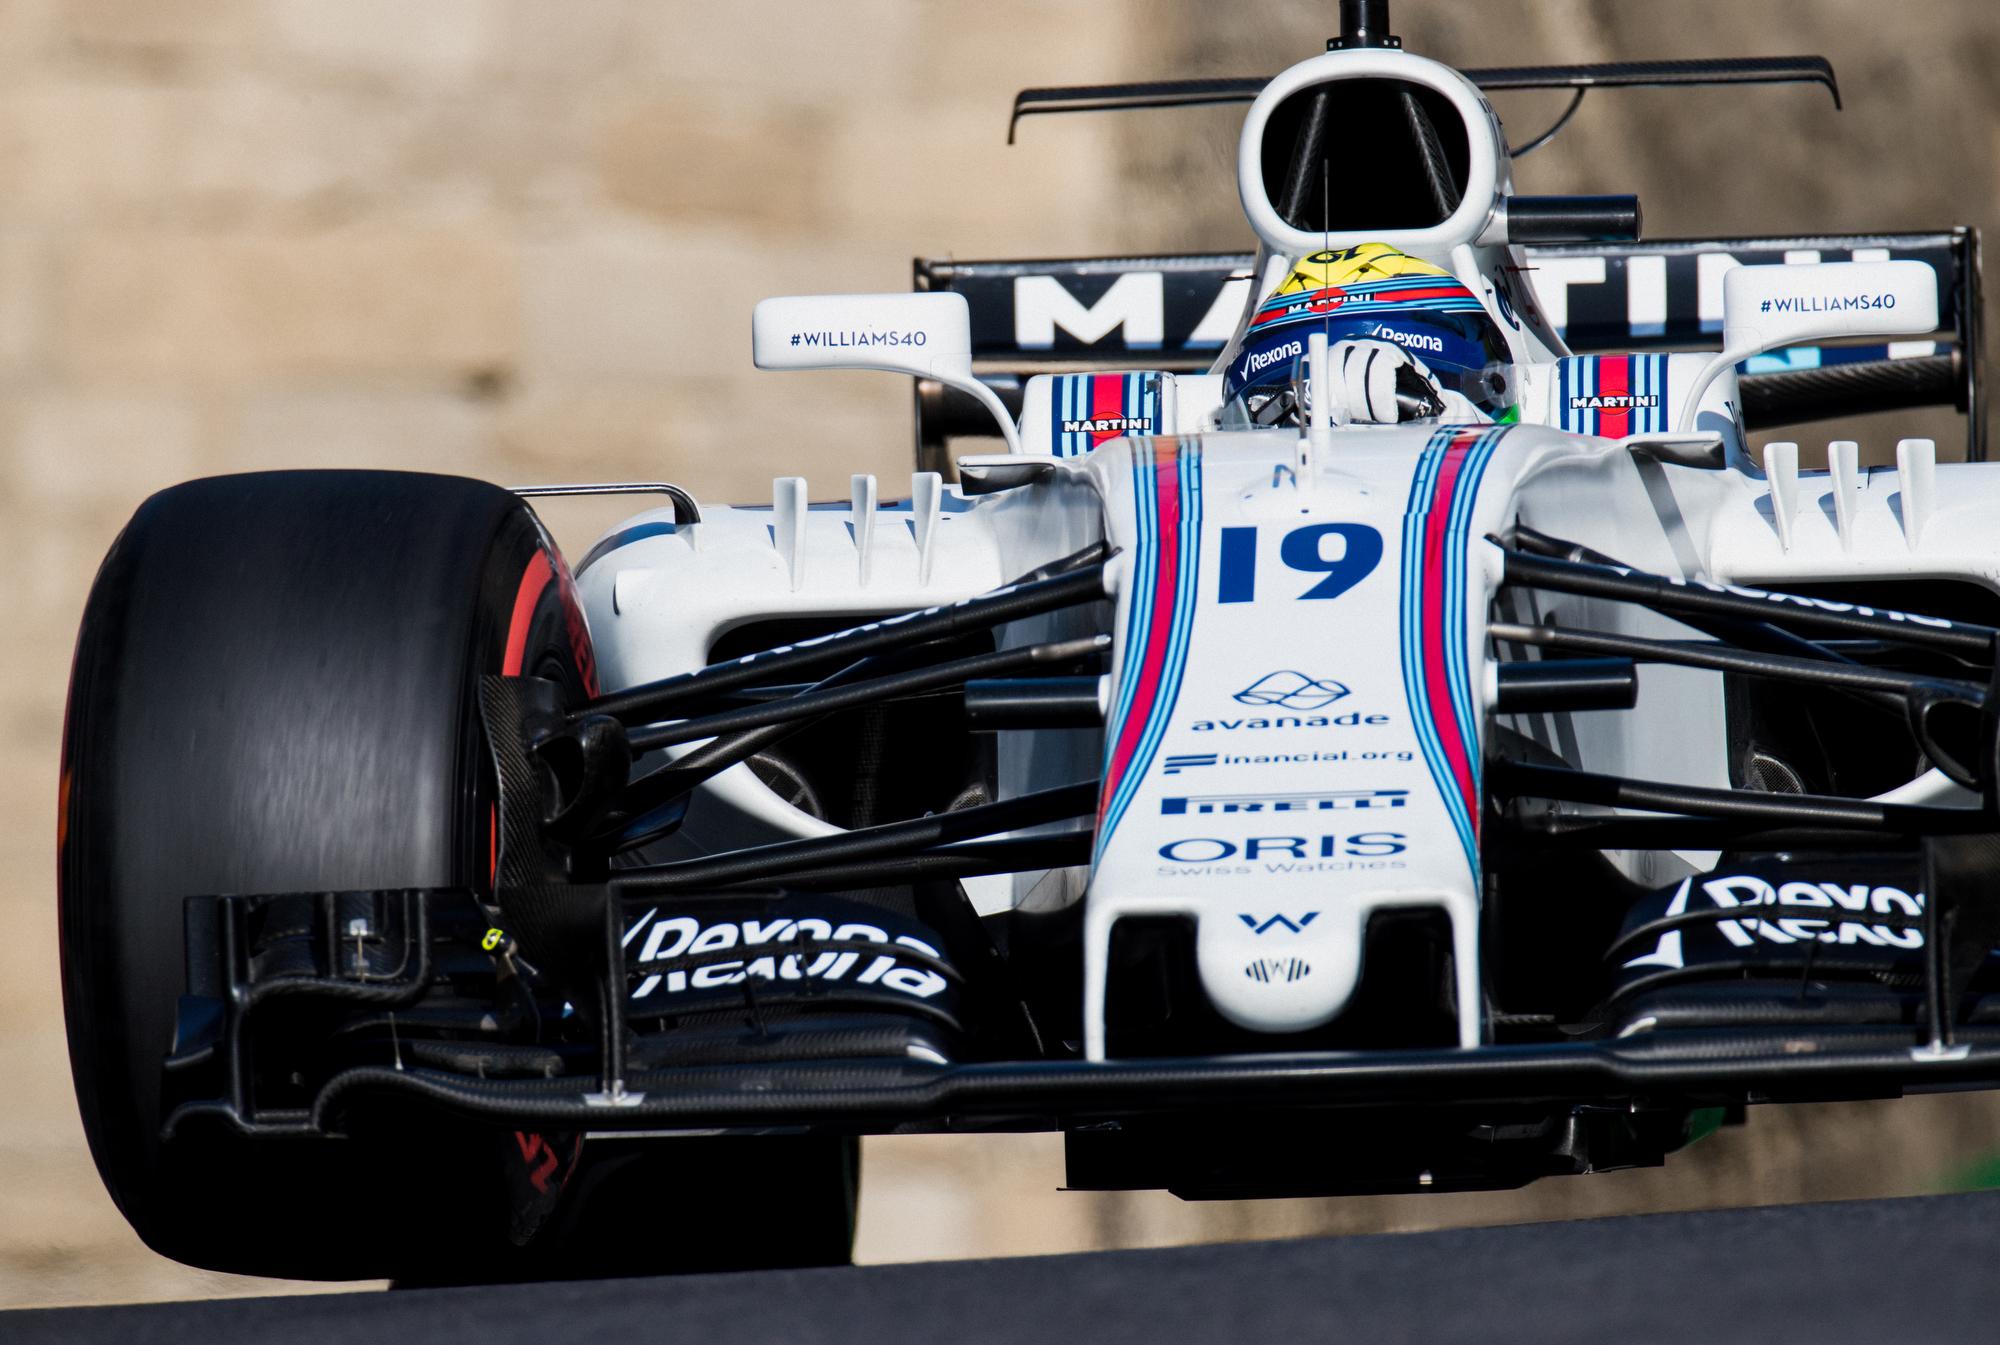 Felipe Massa, Williams. 2017 FIA Formula 1 Championship, Baku, Azerbaijan.